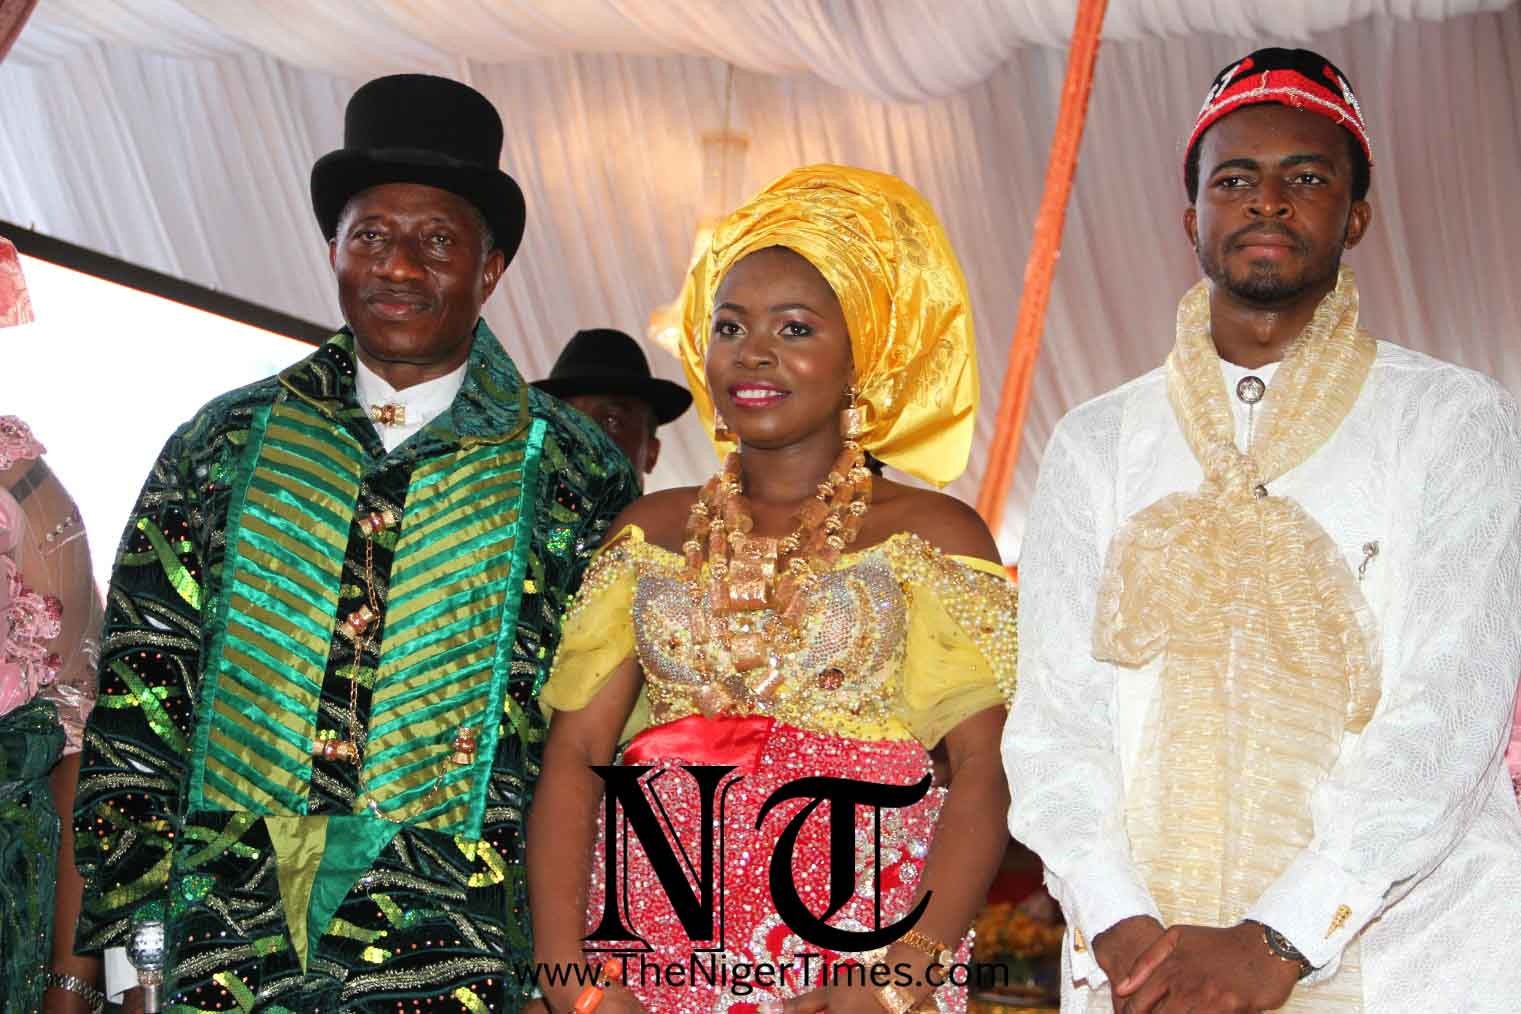 The-niger-times-godswill-faith-wedding-Traditional-Bayelsa-goddluck-70.jpg